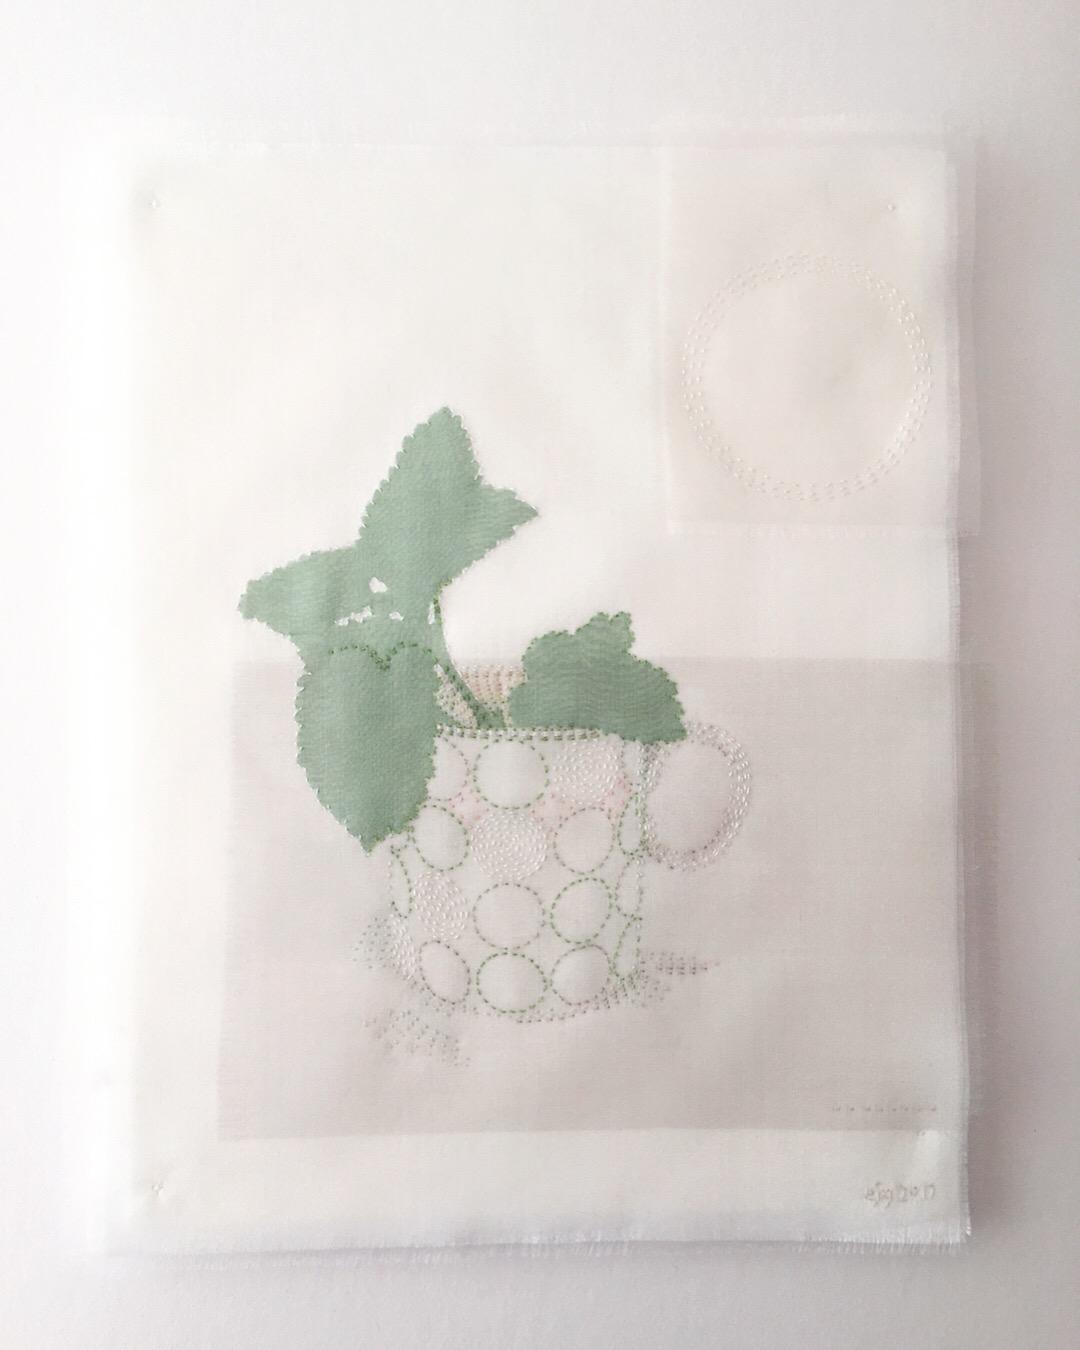 Lemon balm in coffe cup 2017 - Silk organza applique on linen ground, hand stitched. 21cm x 28cm Oak frame 37cm x 47cm - £975